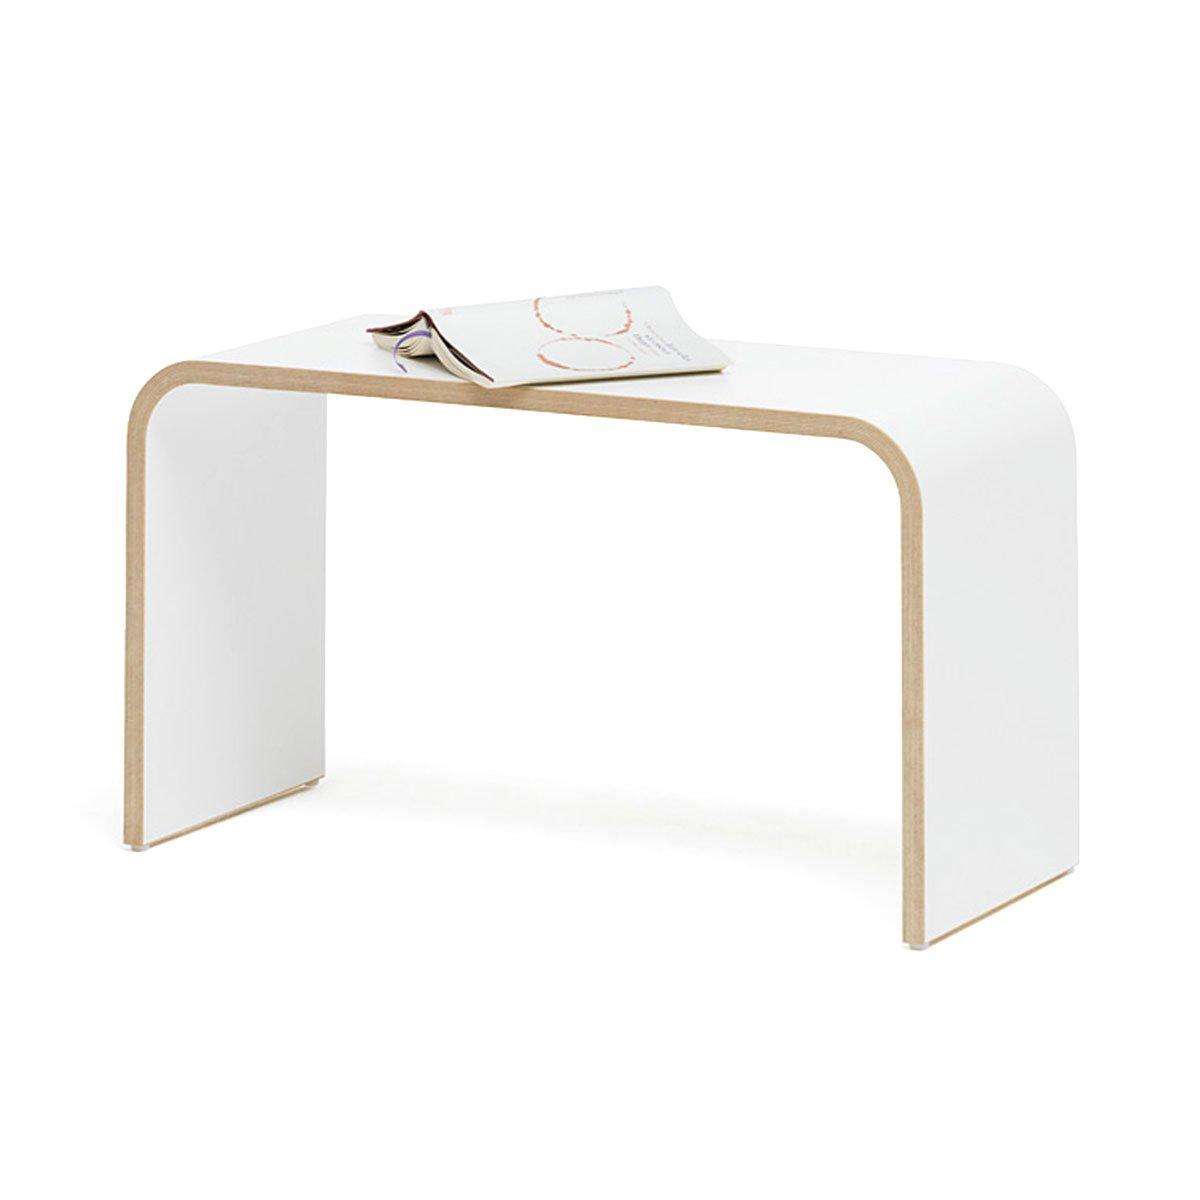 Tojo Sit Bench white